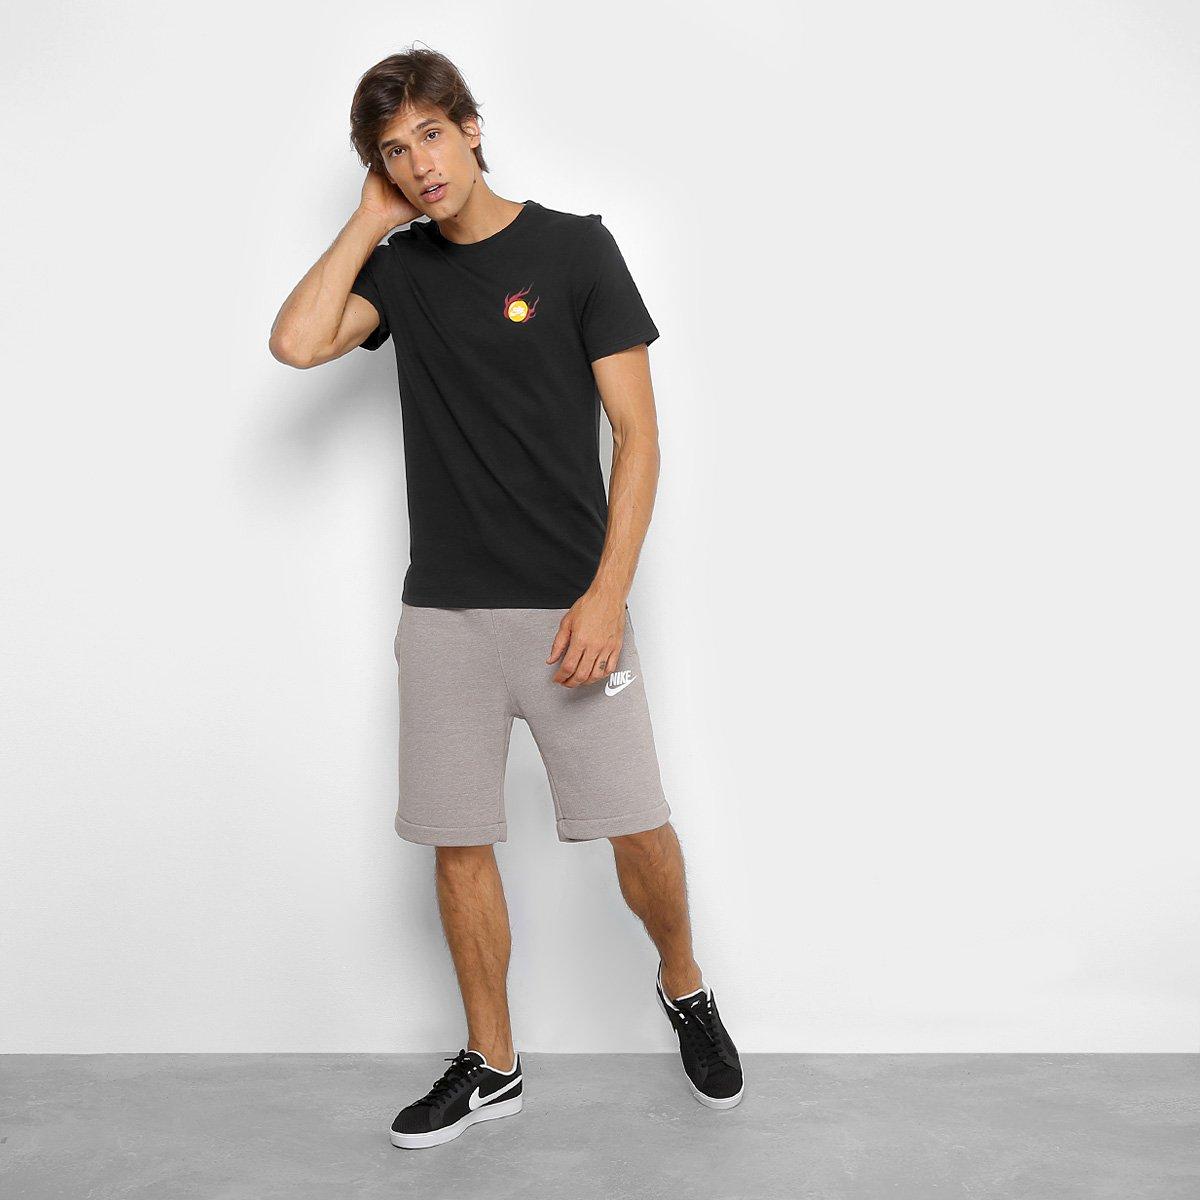 8edeadf532f76 Camiseta Nike M Sb Dragon Masculina - Compre Agora